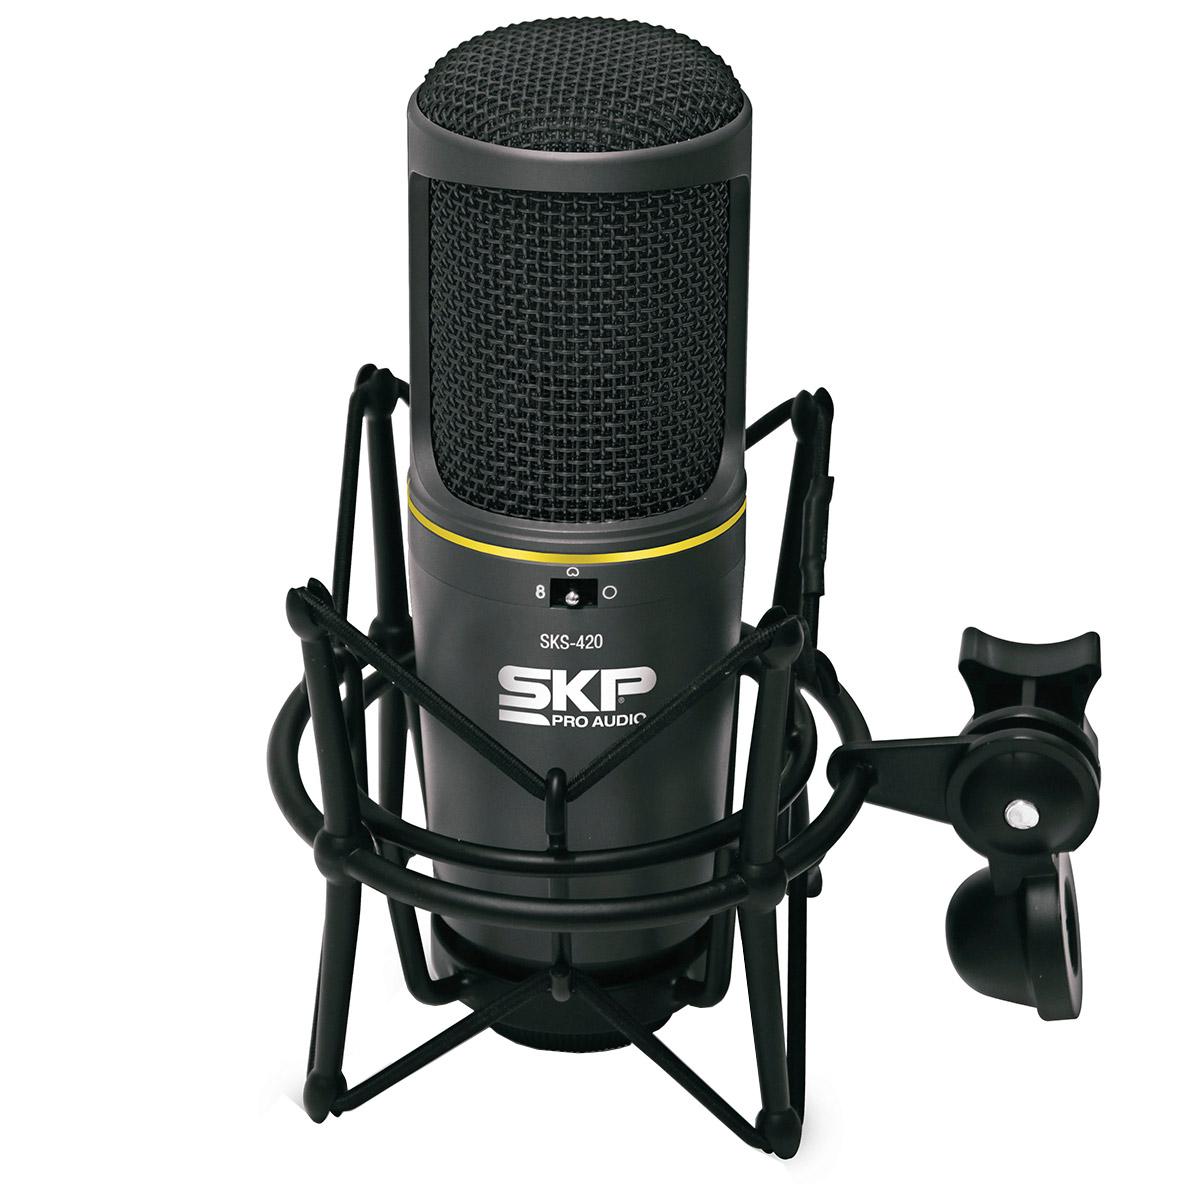 SKS420 - Microfone c/ Fio p/ Est�dio SKS 420 - SKP